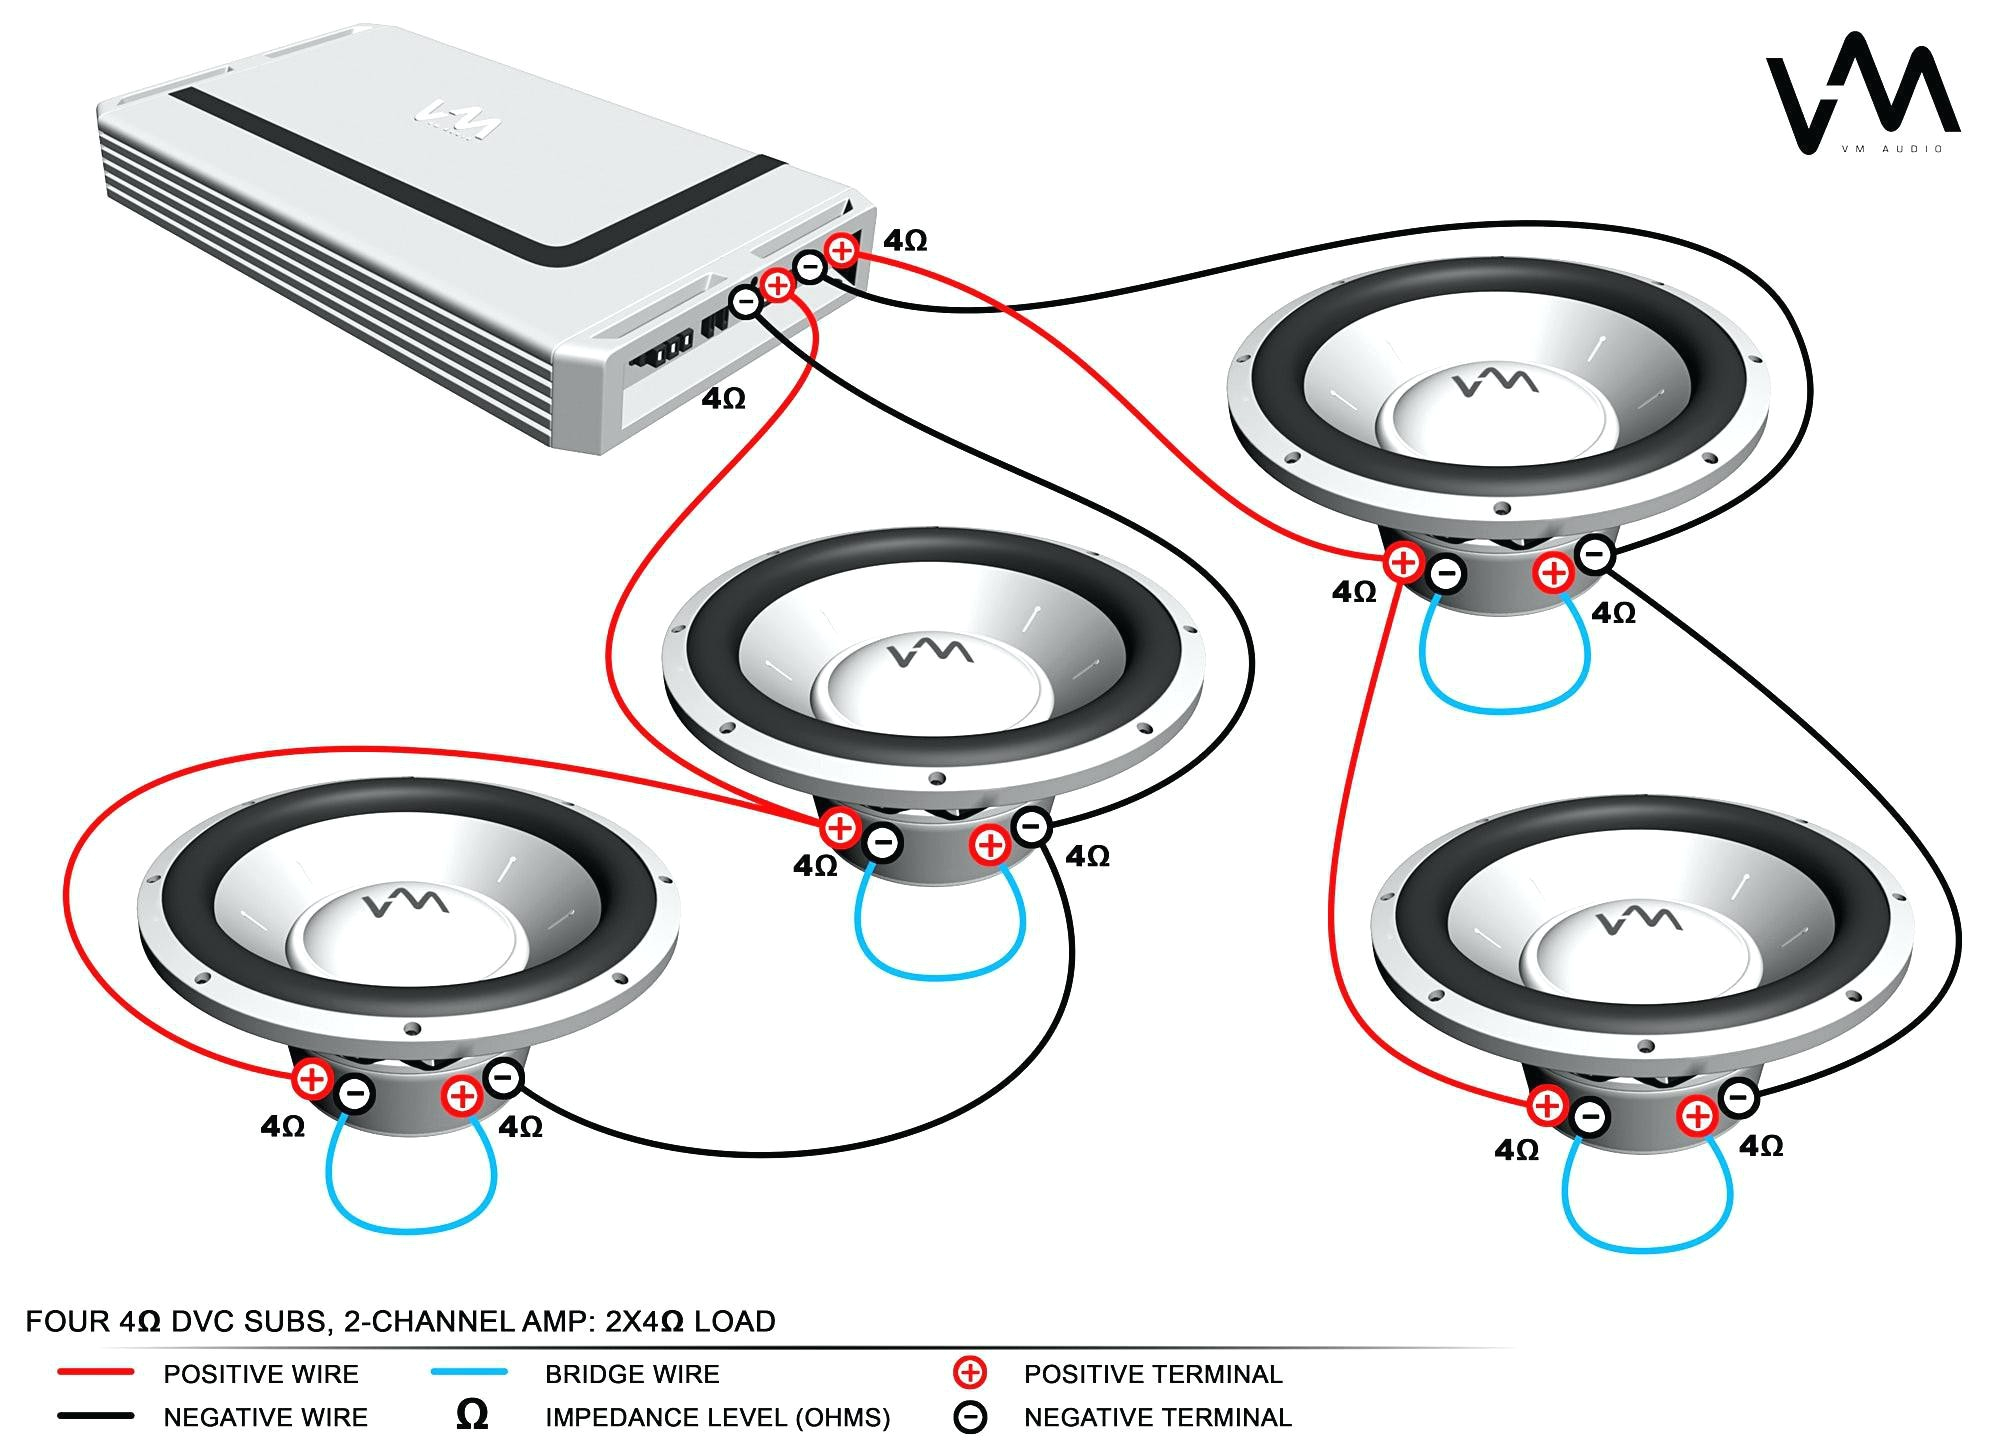 Dual Subwoofer Wiring Diagram Cvr 12 Wiring Diagram Wiring Diagram Centre